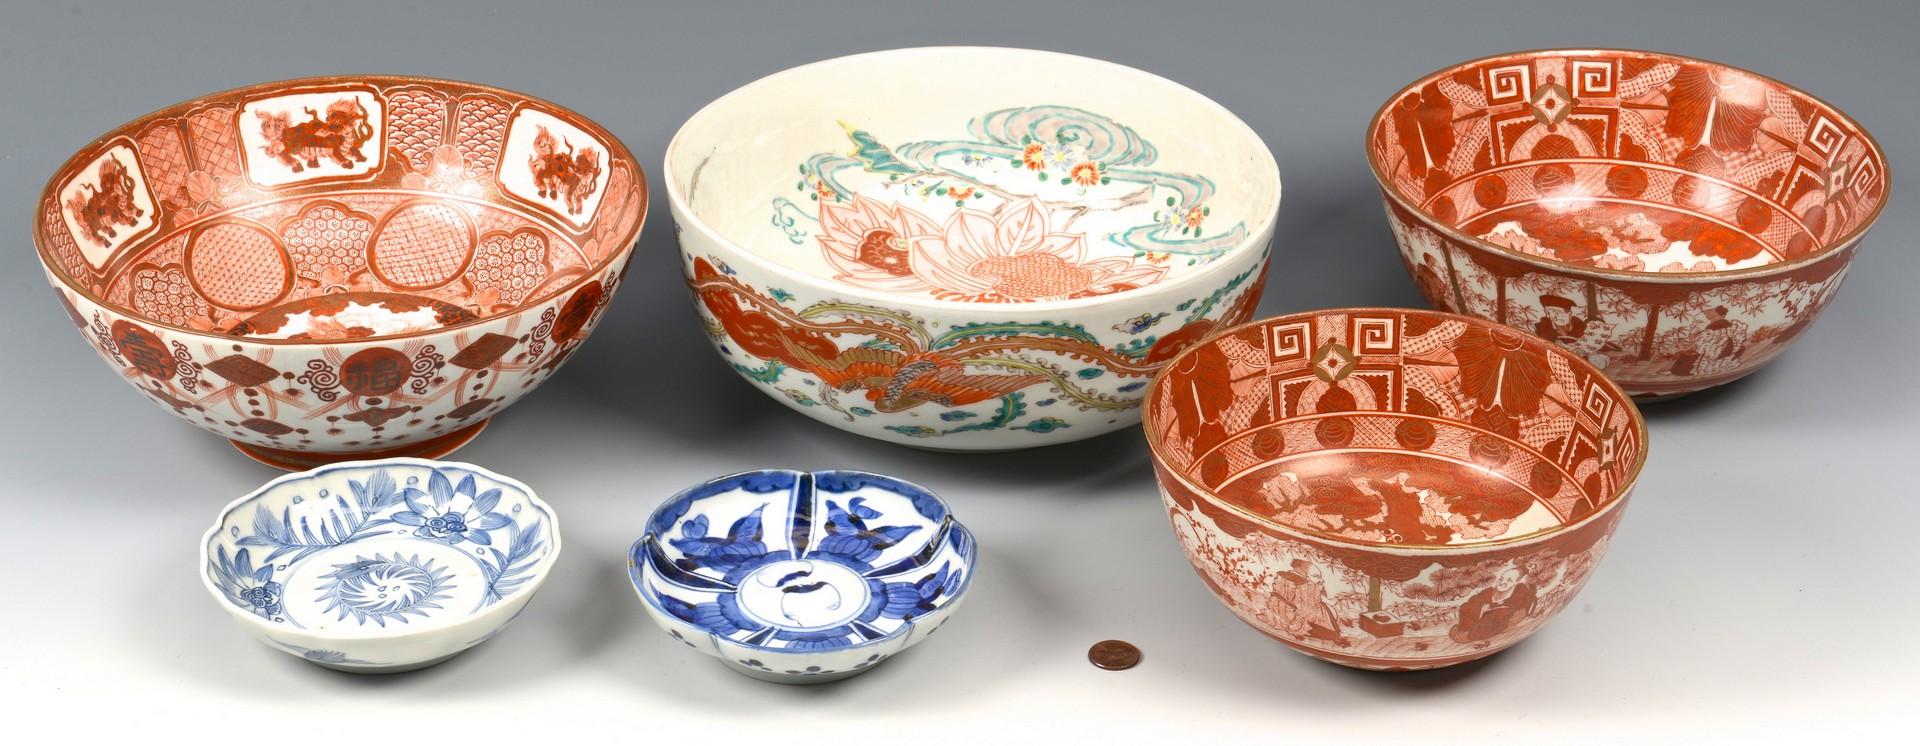 Lot 719: 6 Asian Porcelain Bowls incl. Gilded Kutani